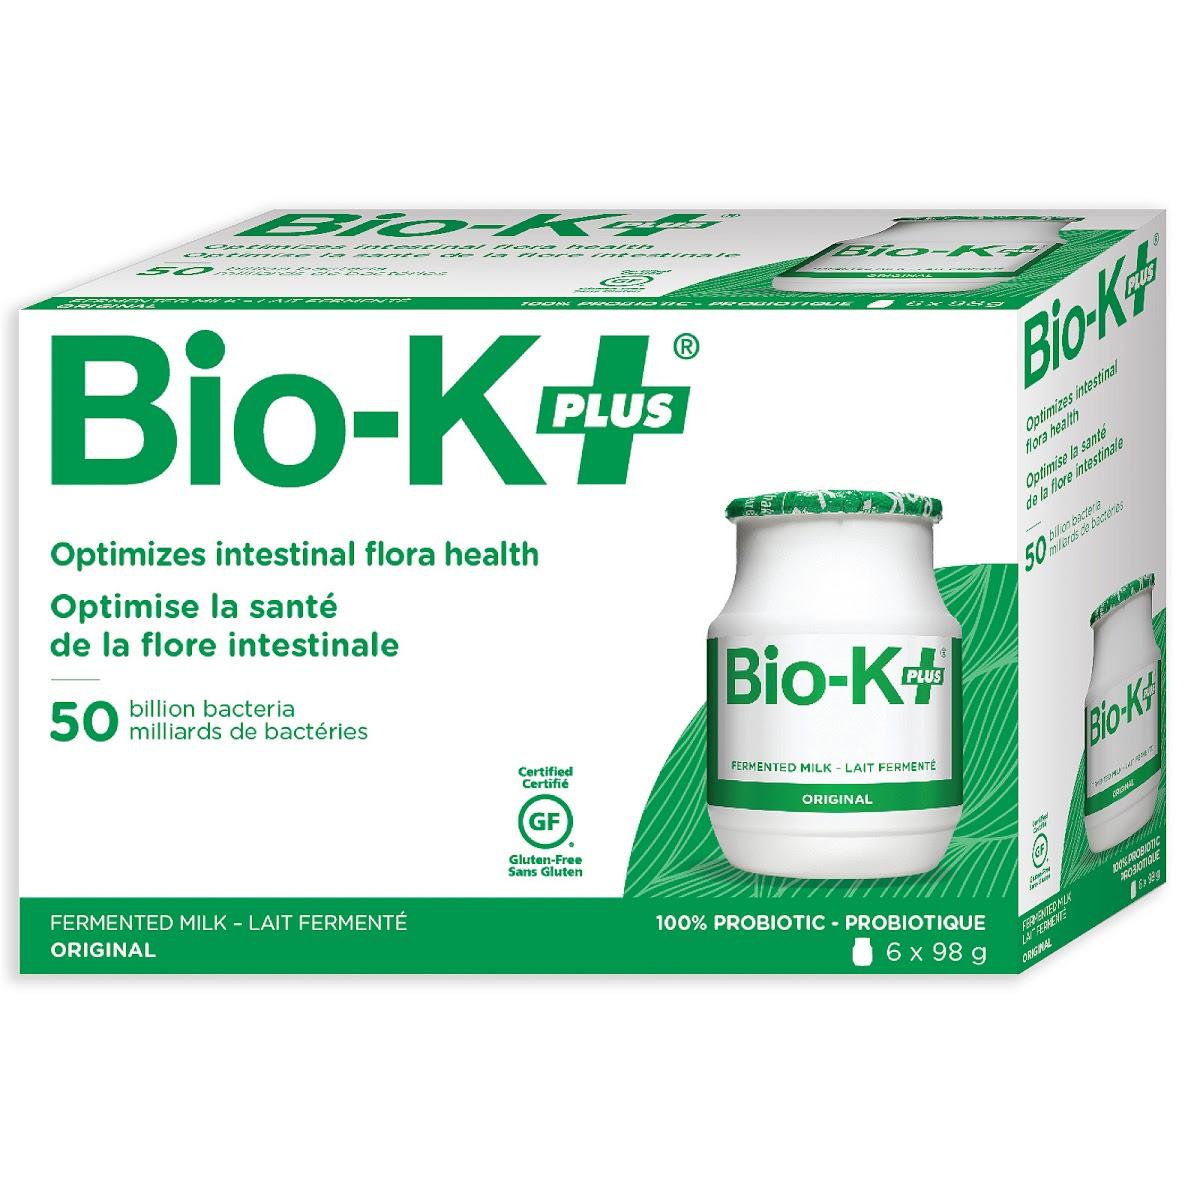 Original Drinkable Probiotic - 6 Pack